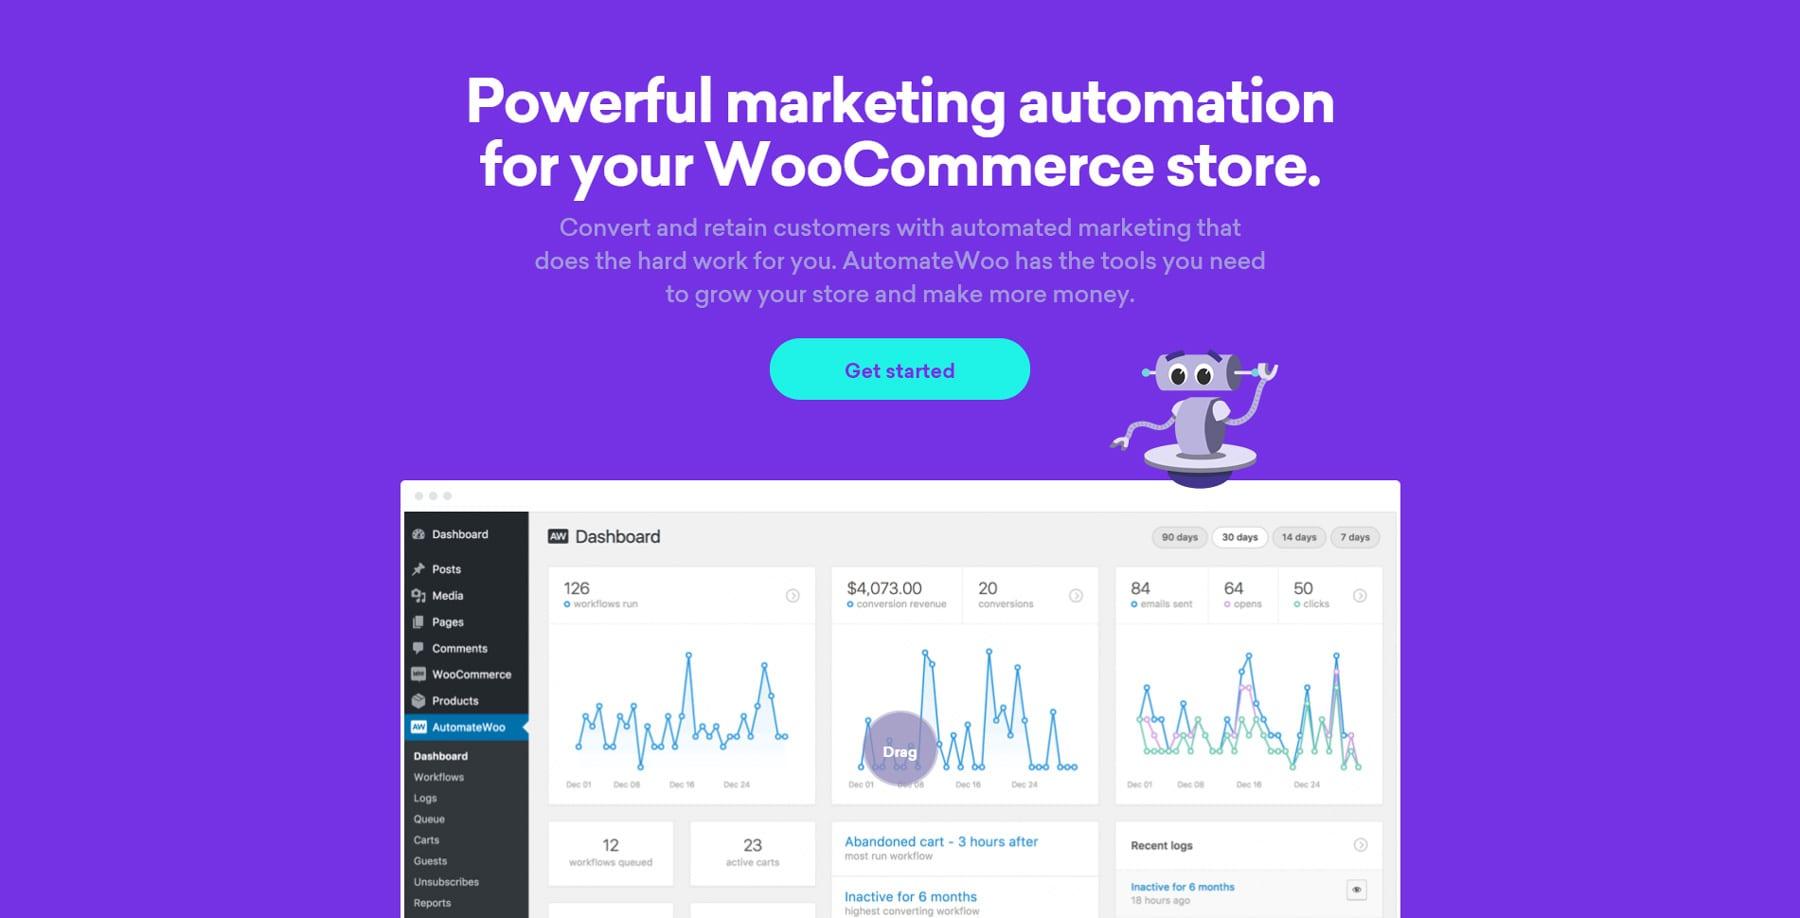 automate-woo-plugin